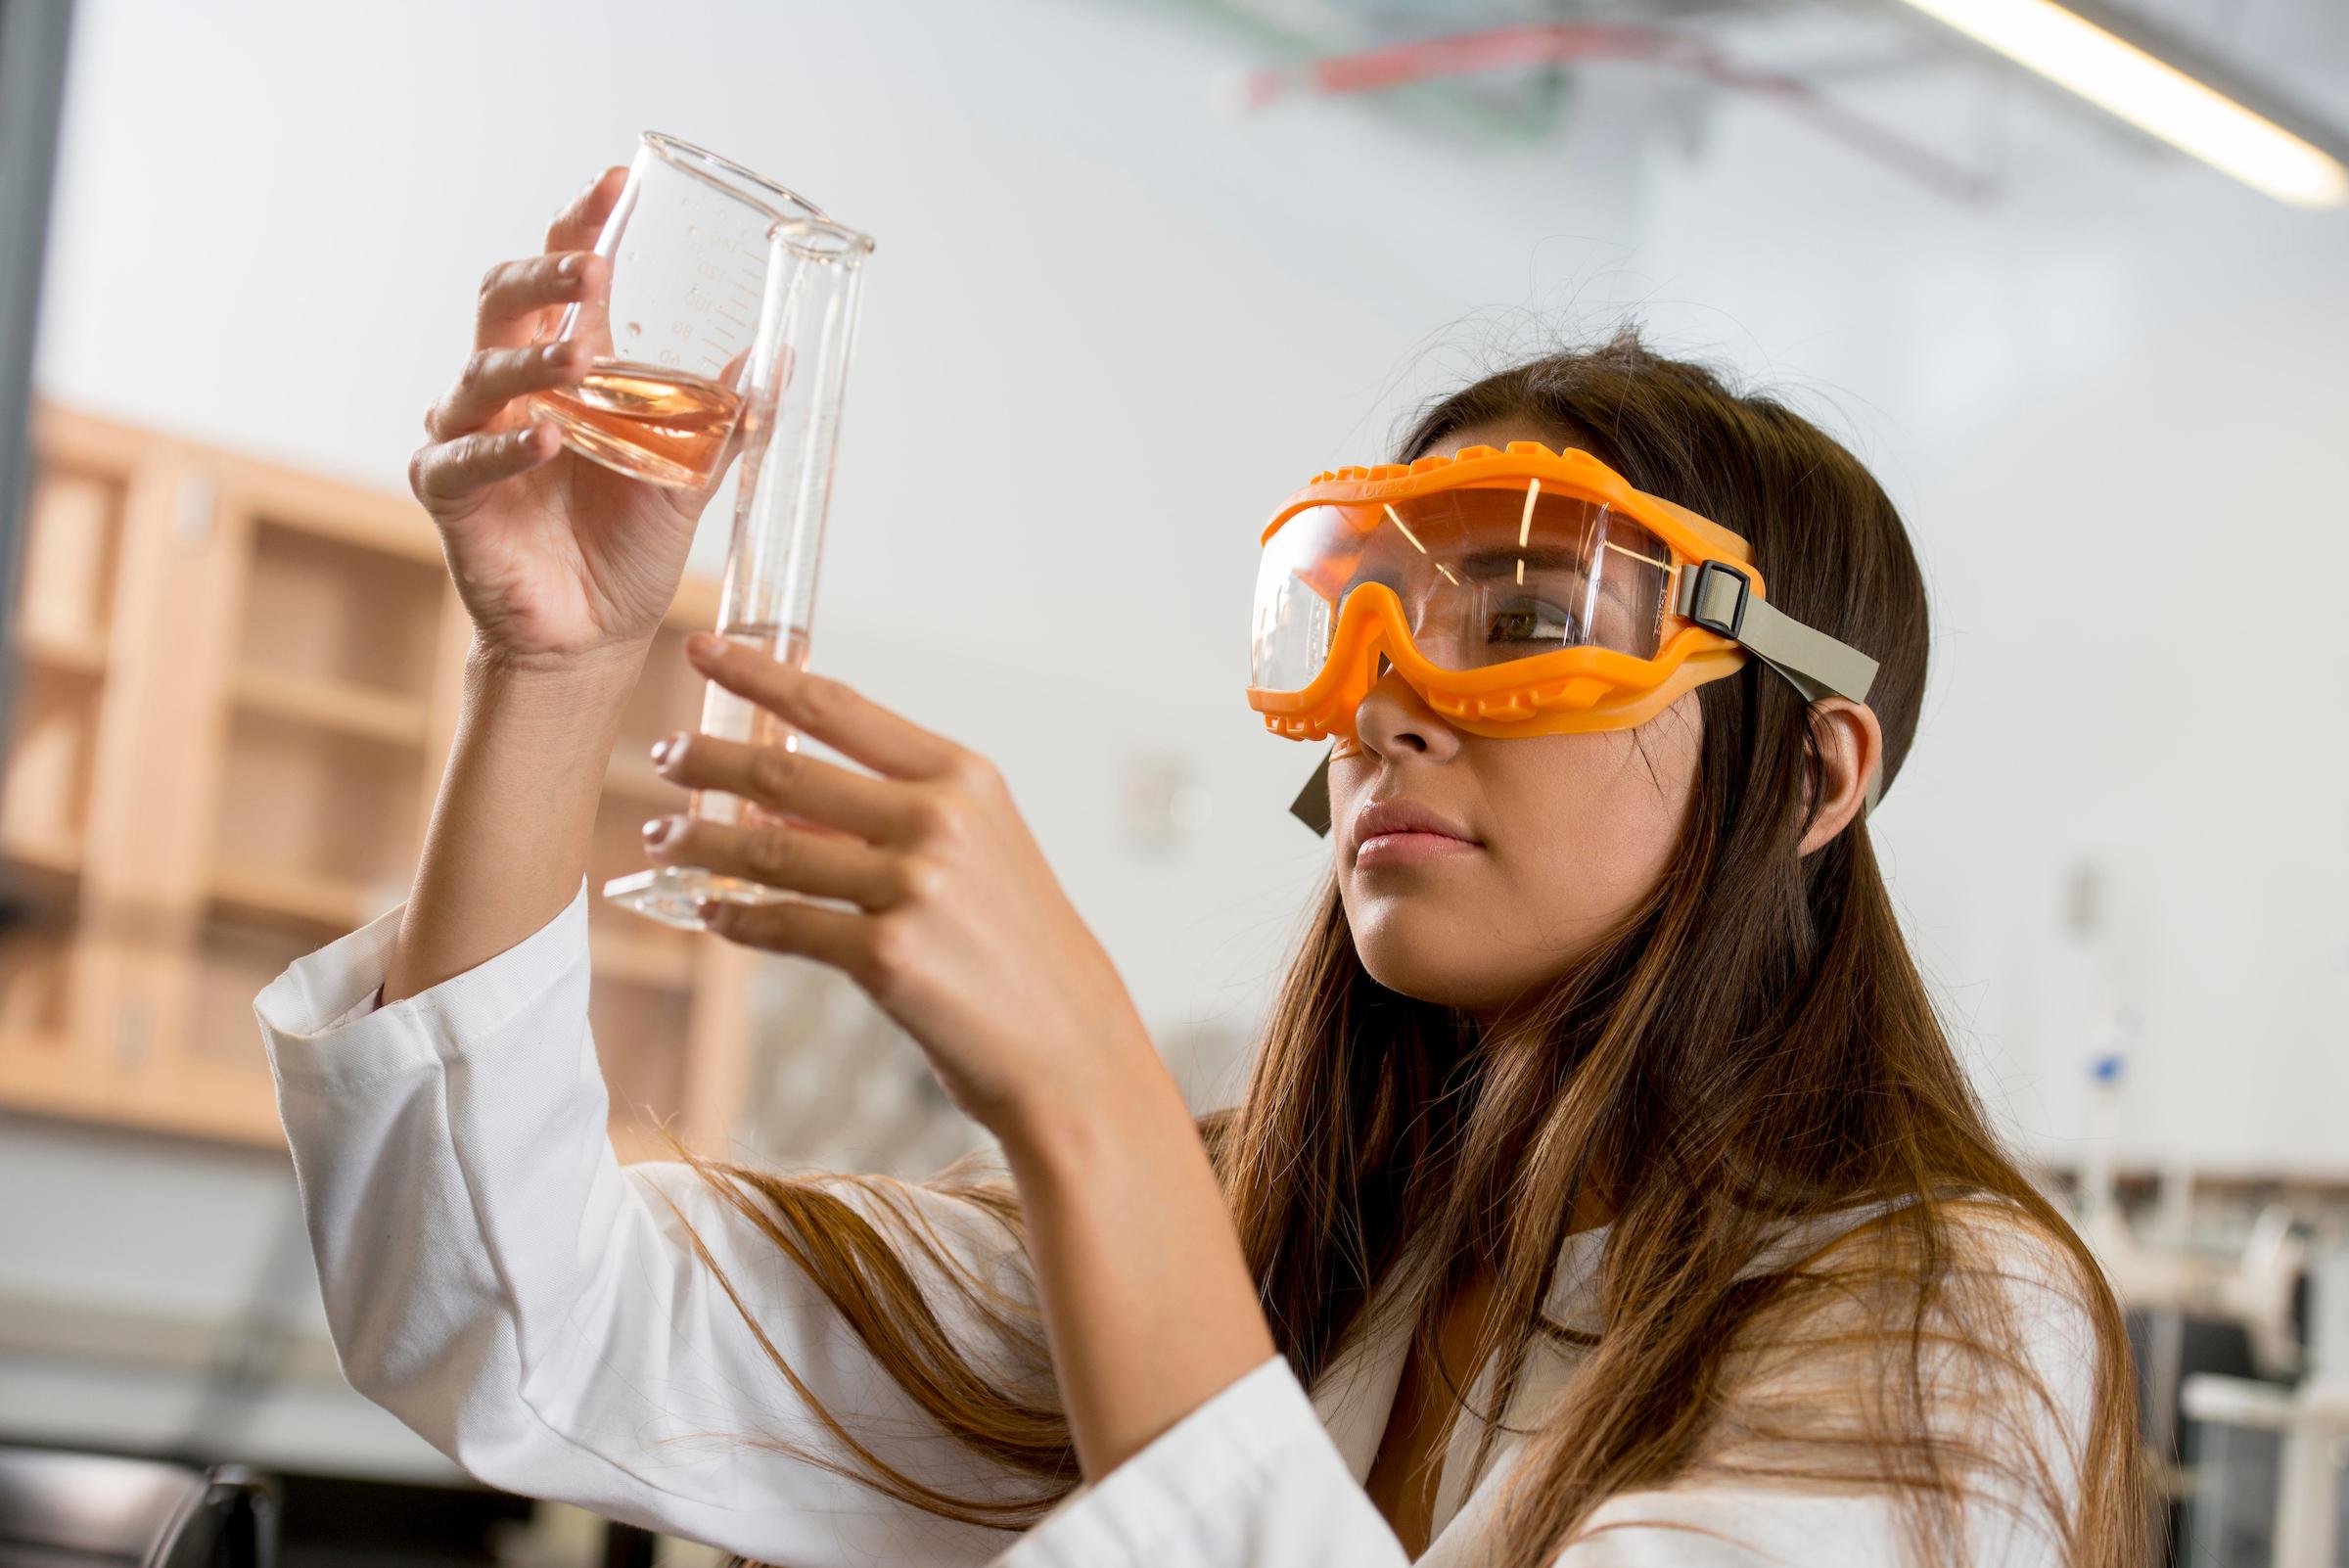 Female NAU student working in chemistry lab